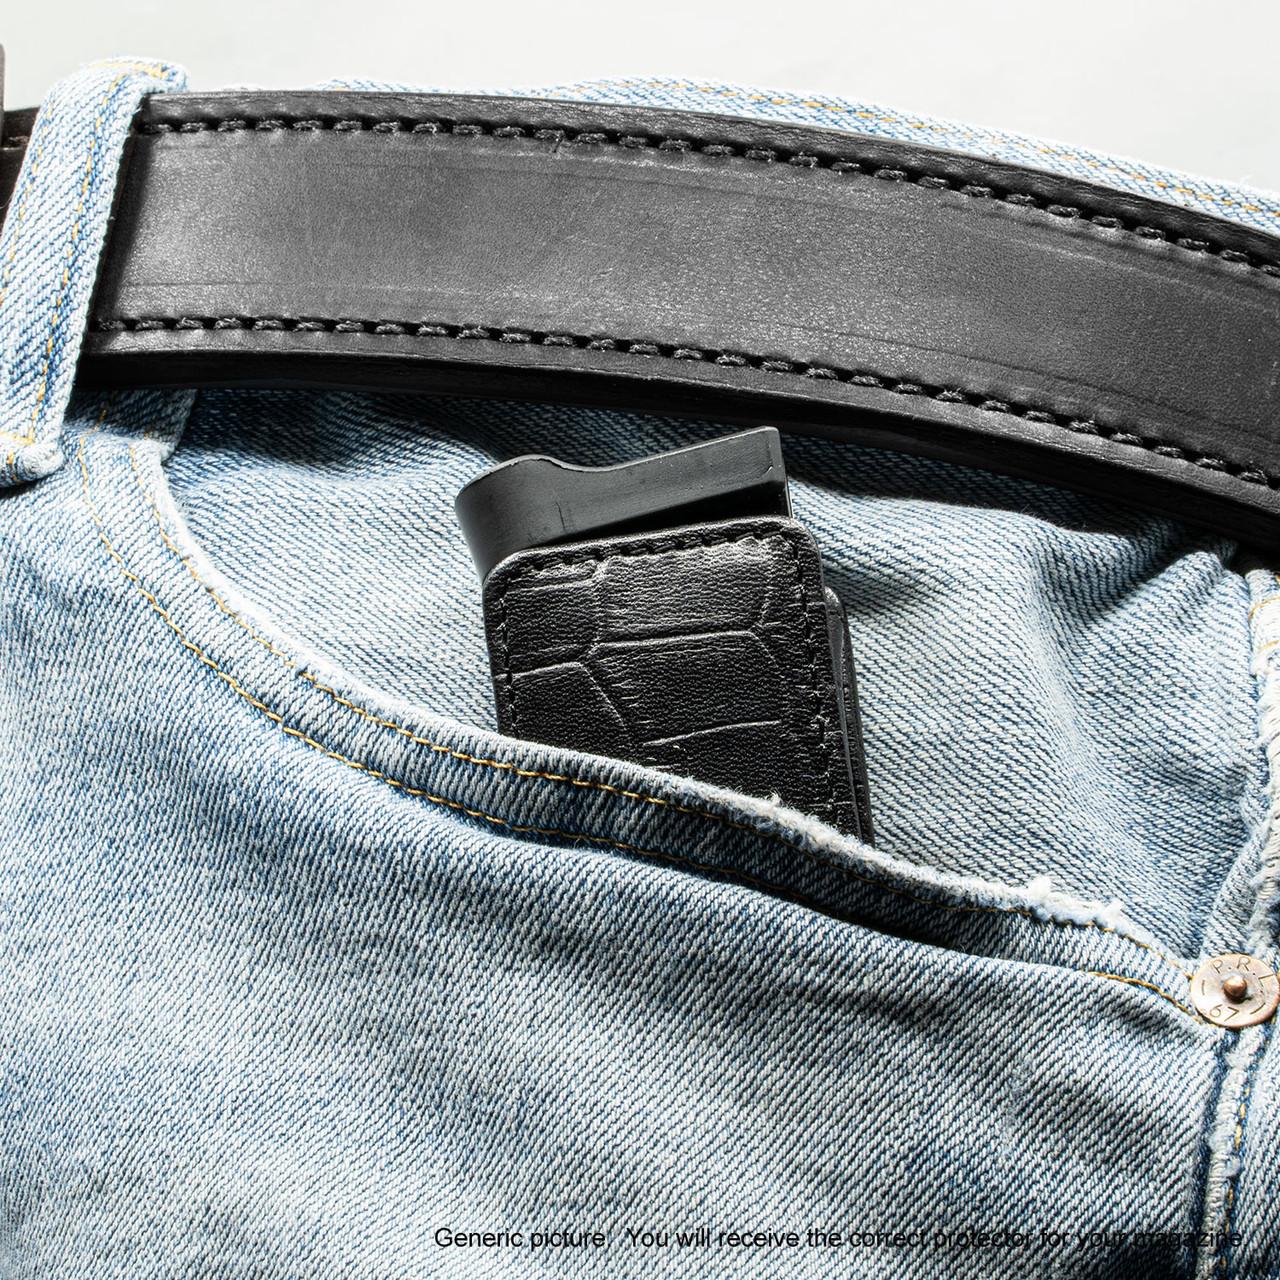 Sig P290 Black Alligator Magazine Pocket Protector